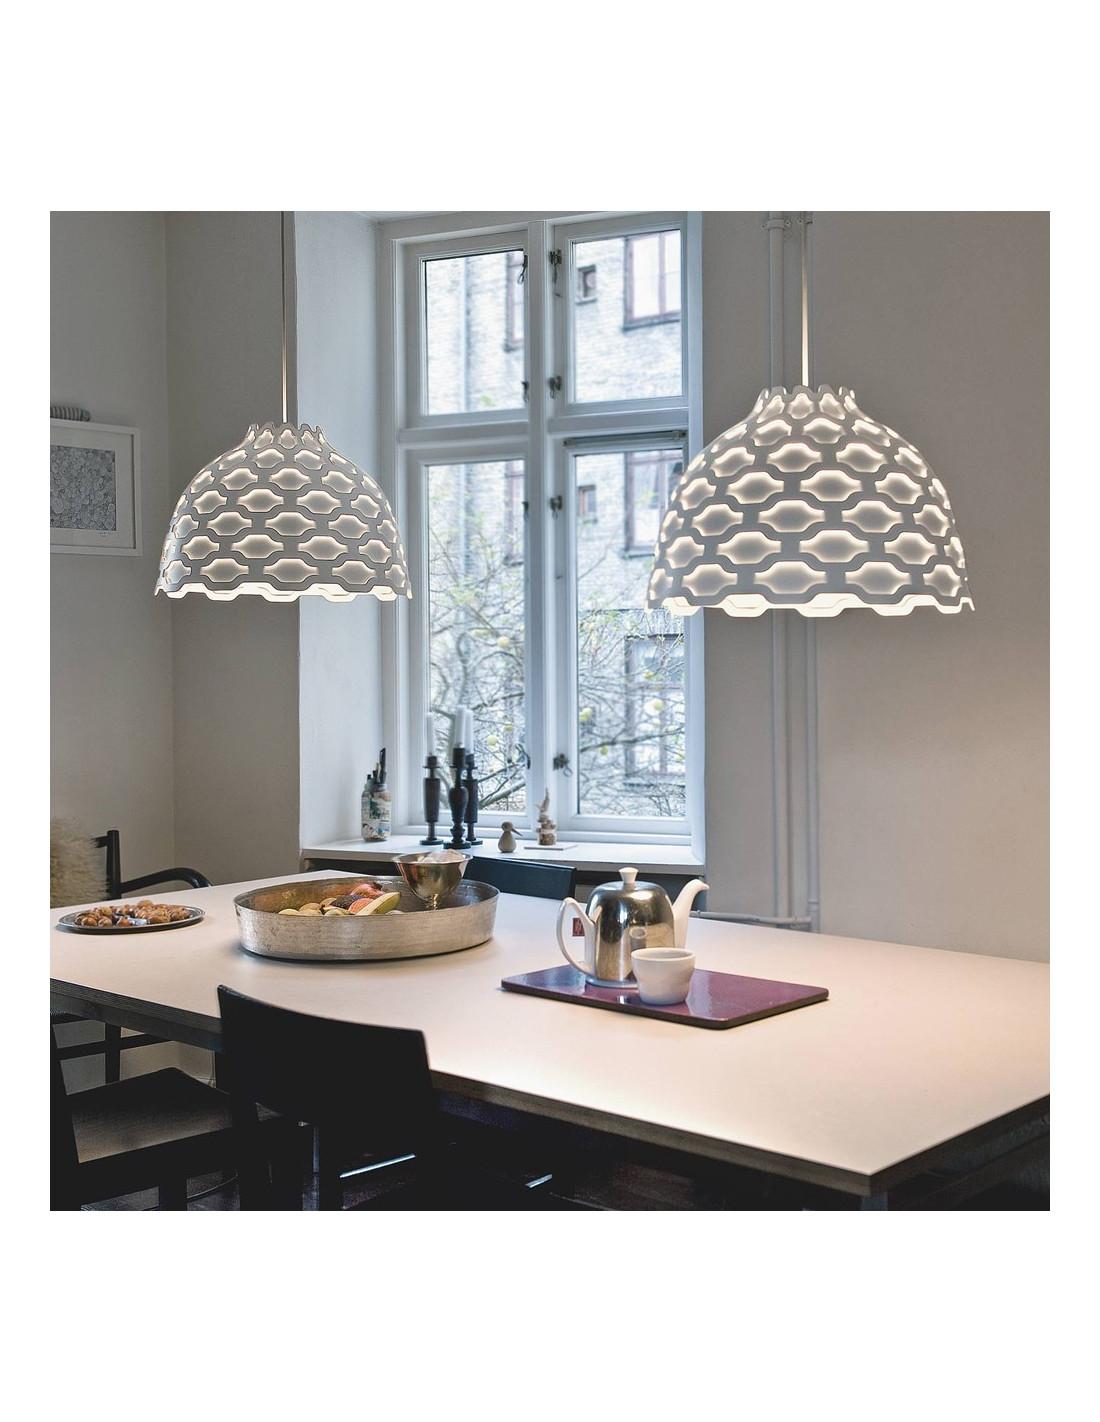 lc shutters pendant louise campbell design for louis. Black Bedroom Furniture Sets. Home Design Ideas